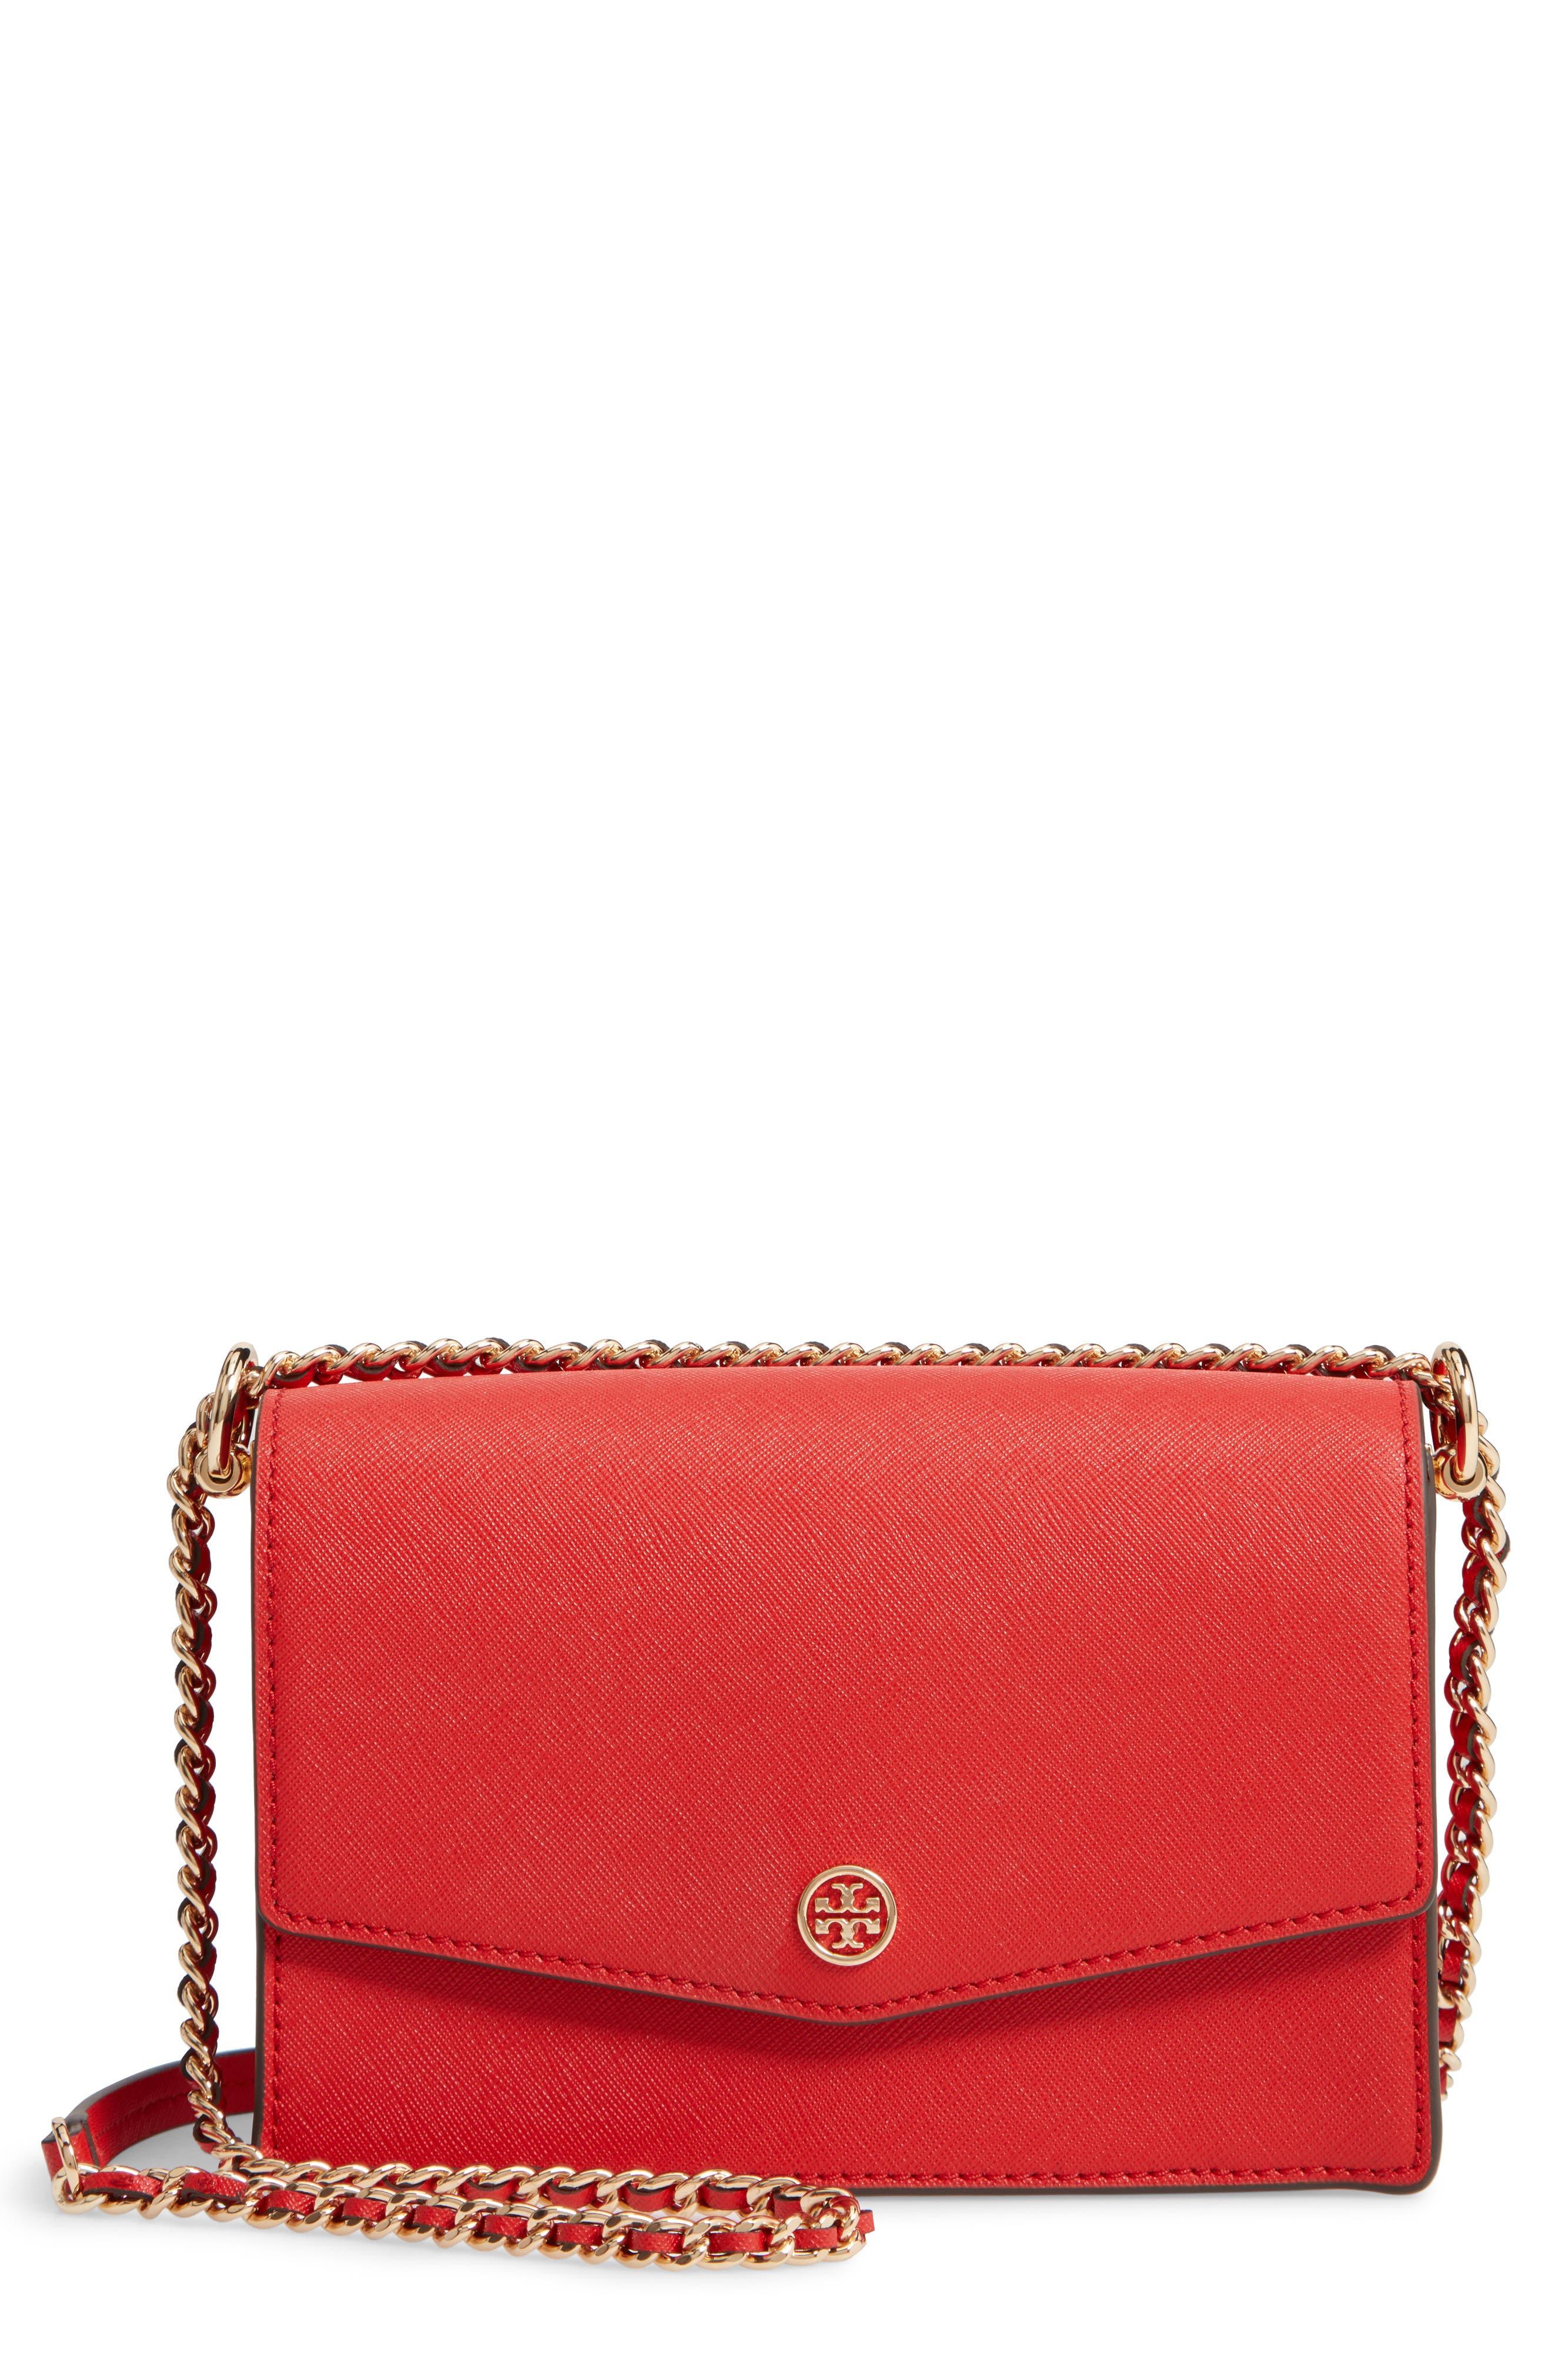 Mini Robinson Convertible Leather Shoulder Bag,                         Main,                         color, BRILLIANT RED